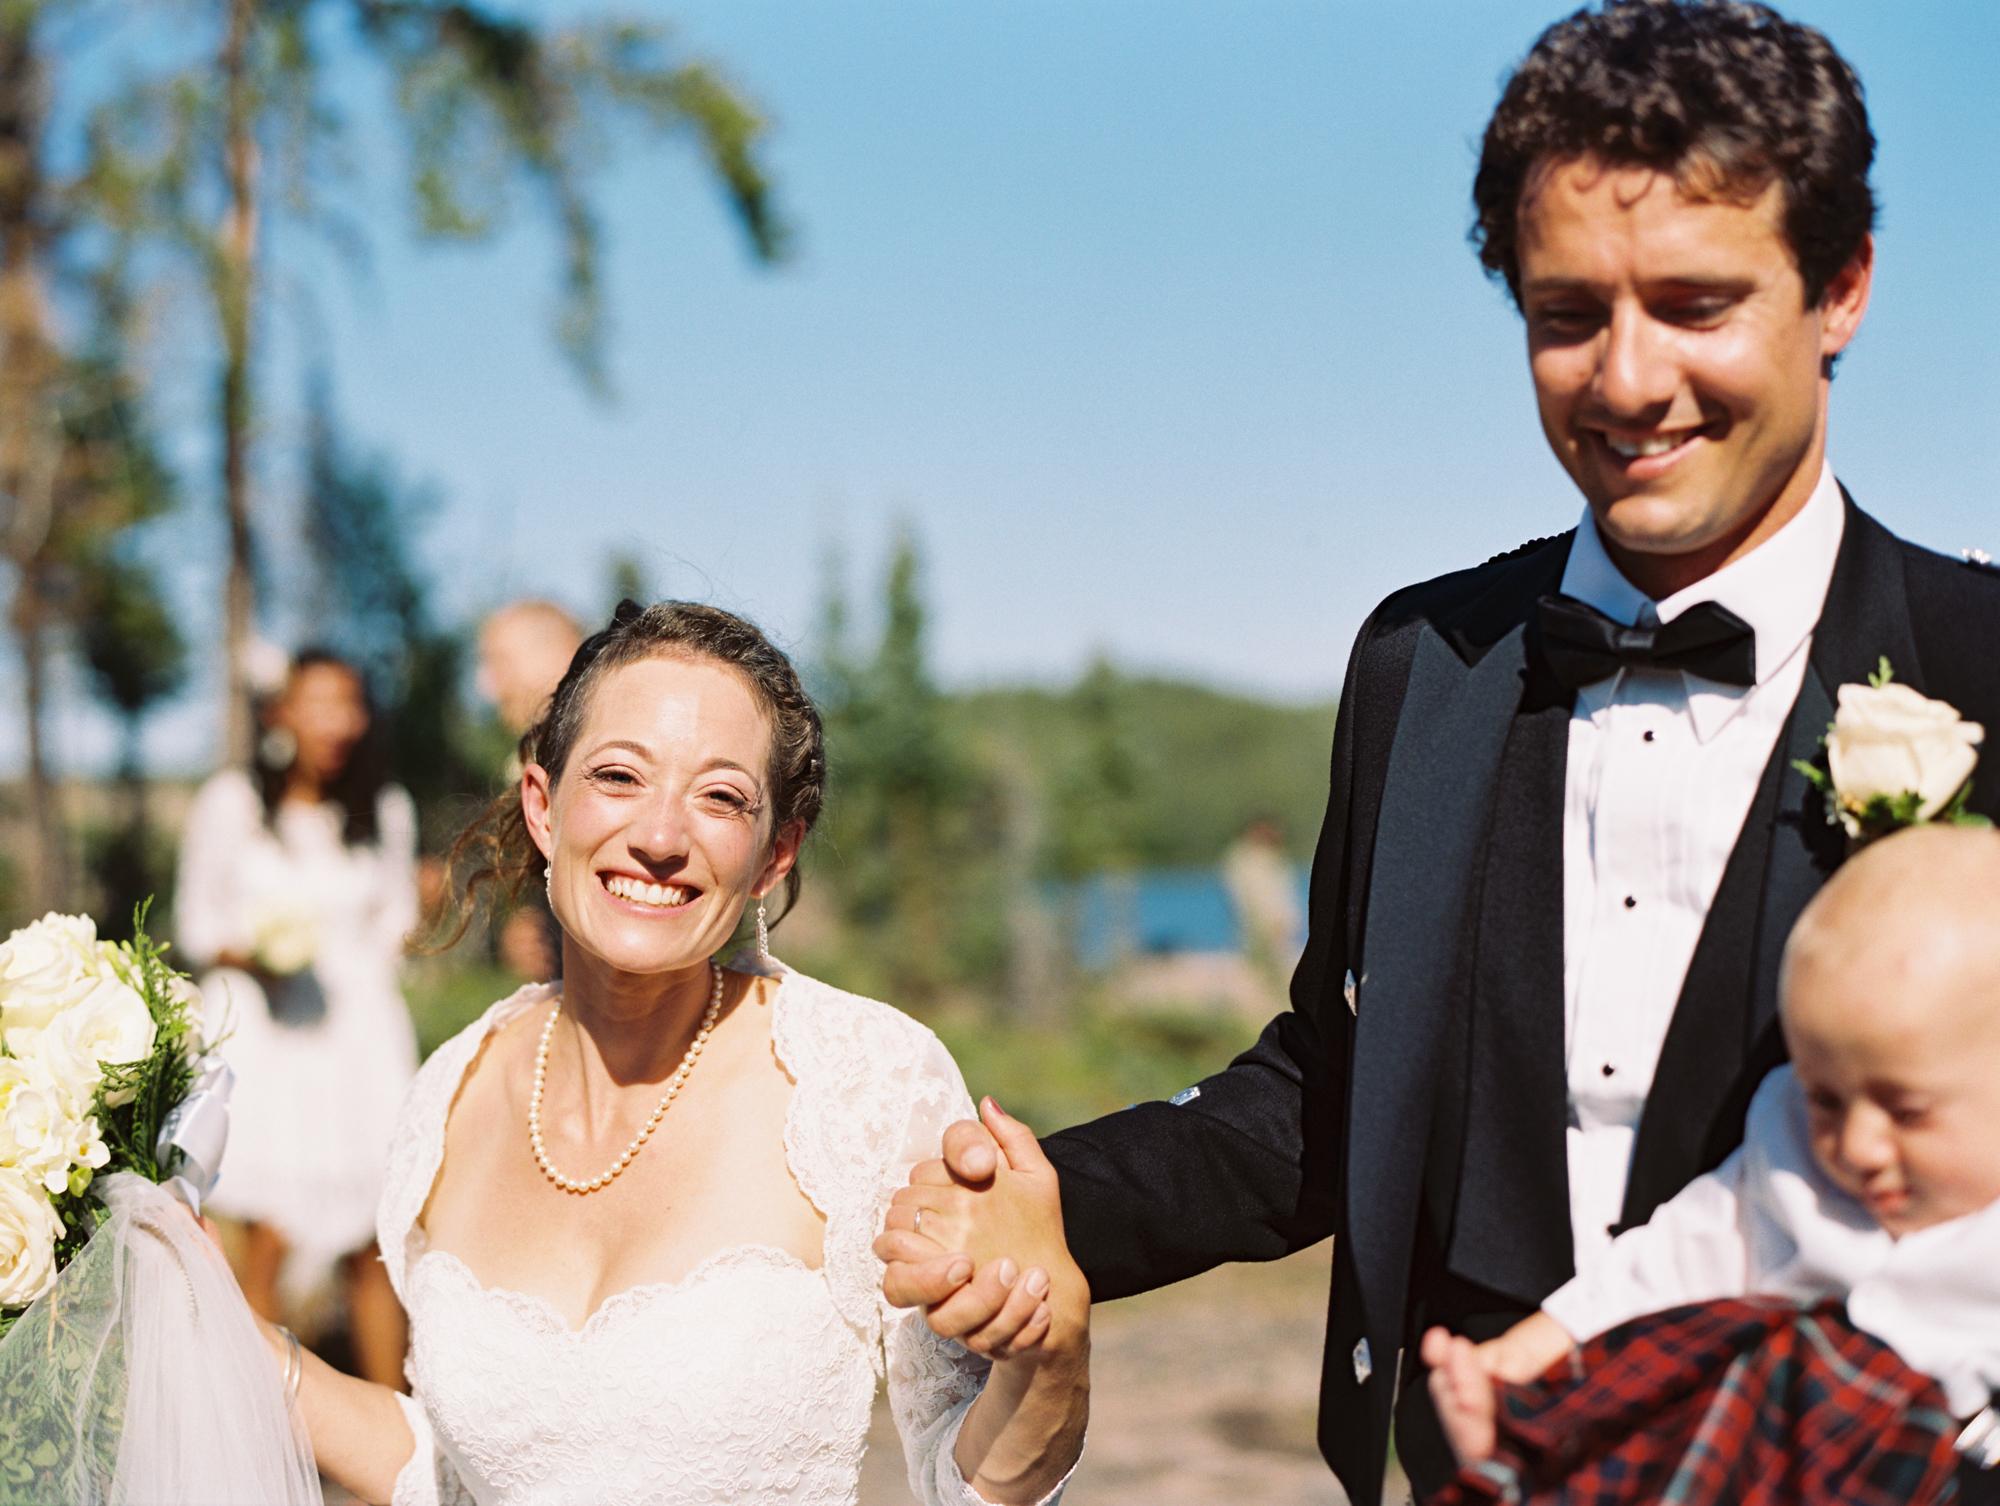 Bride and groom walking back after ceremony